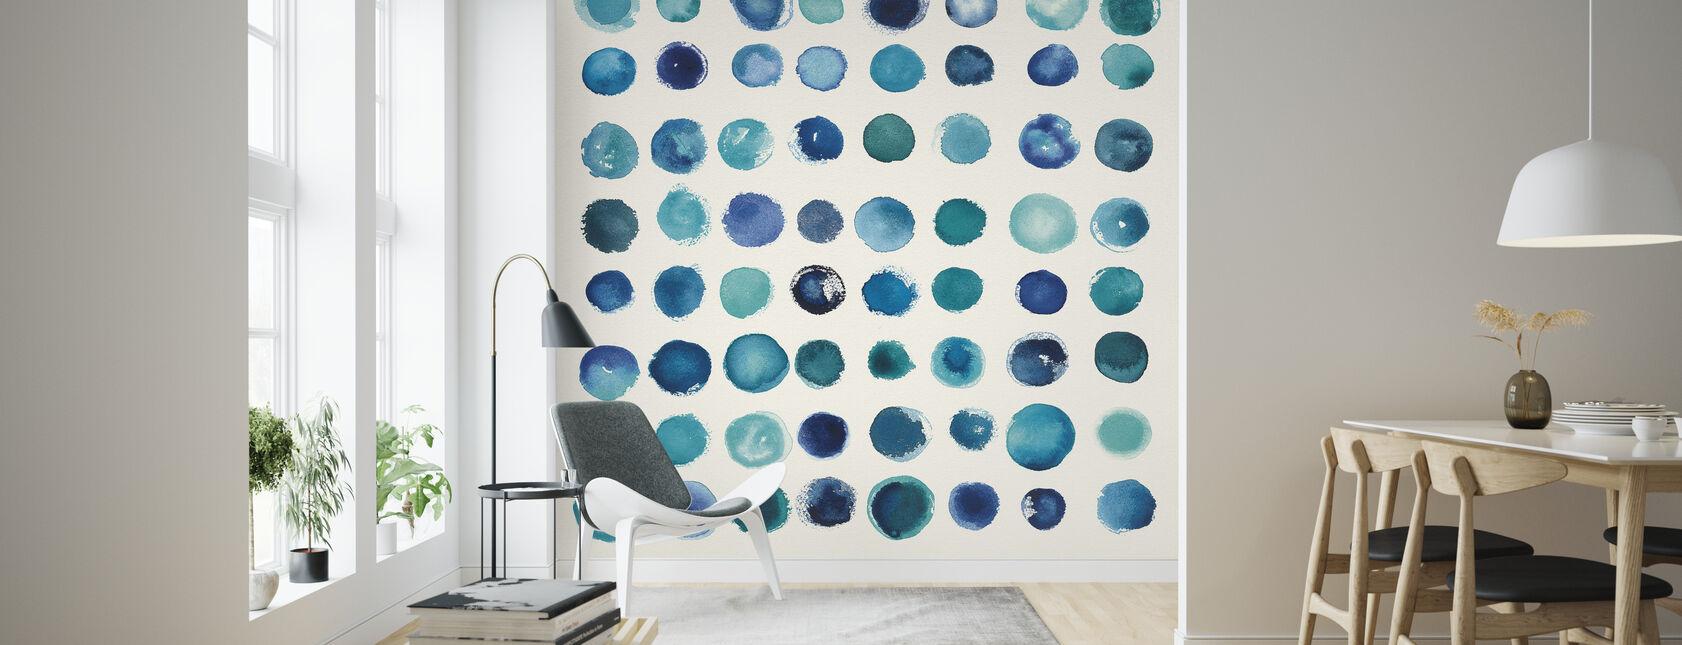 Spot of Rain - Wallpaper - Living Room